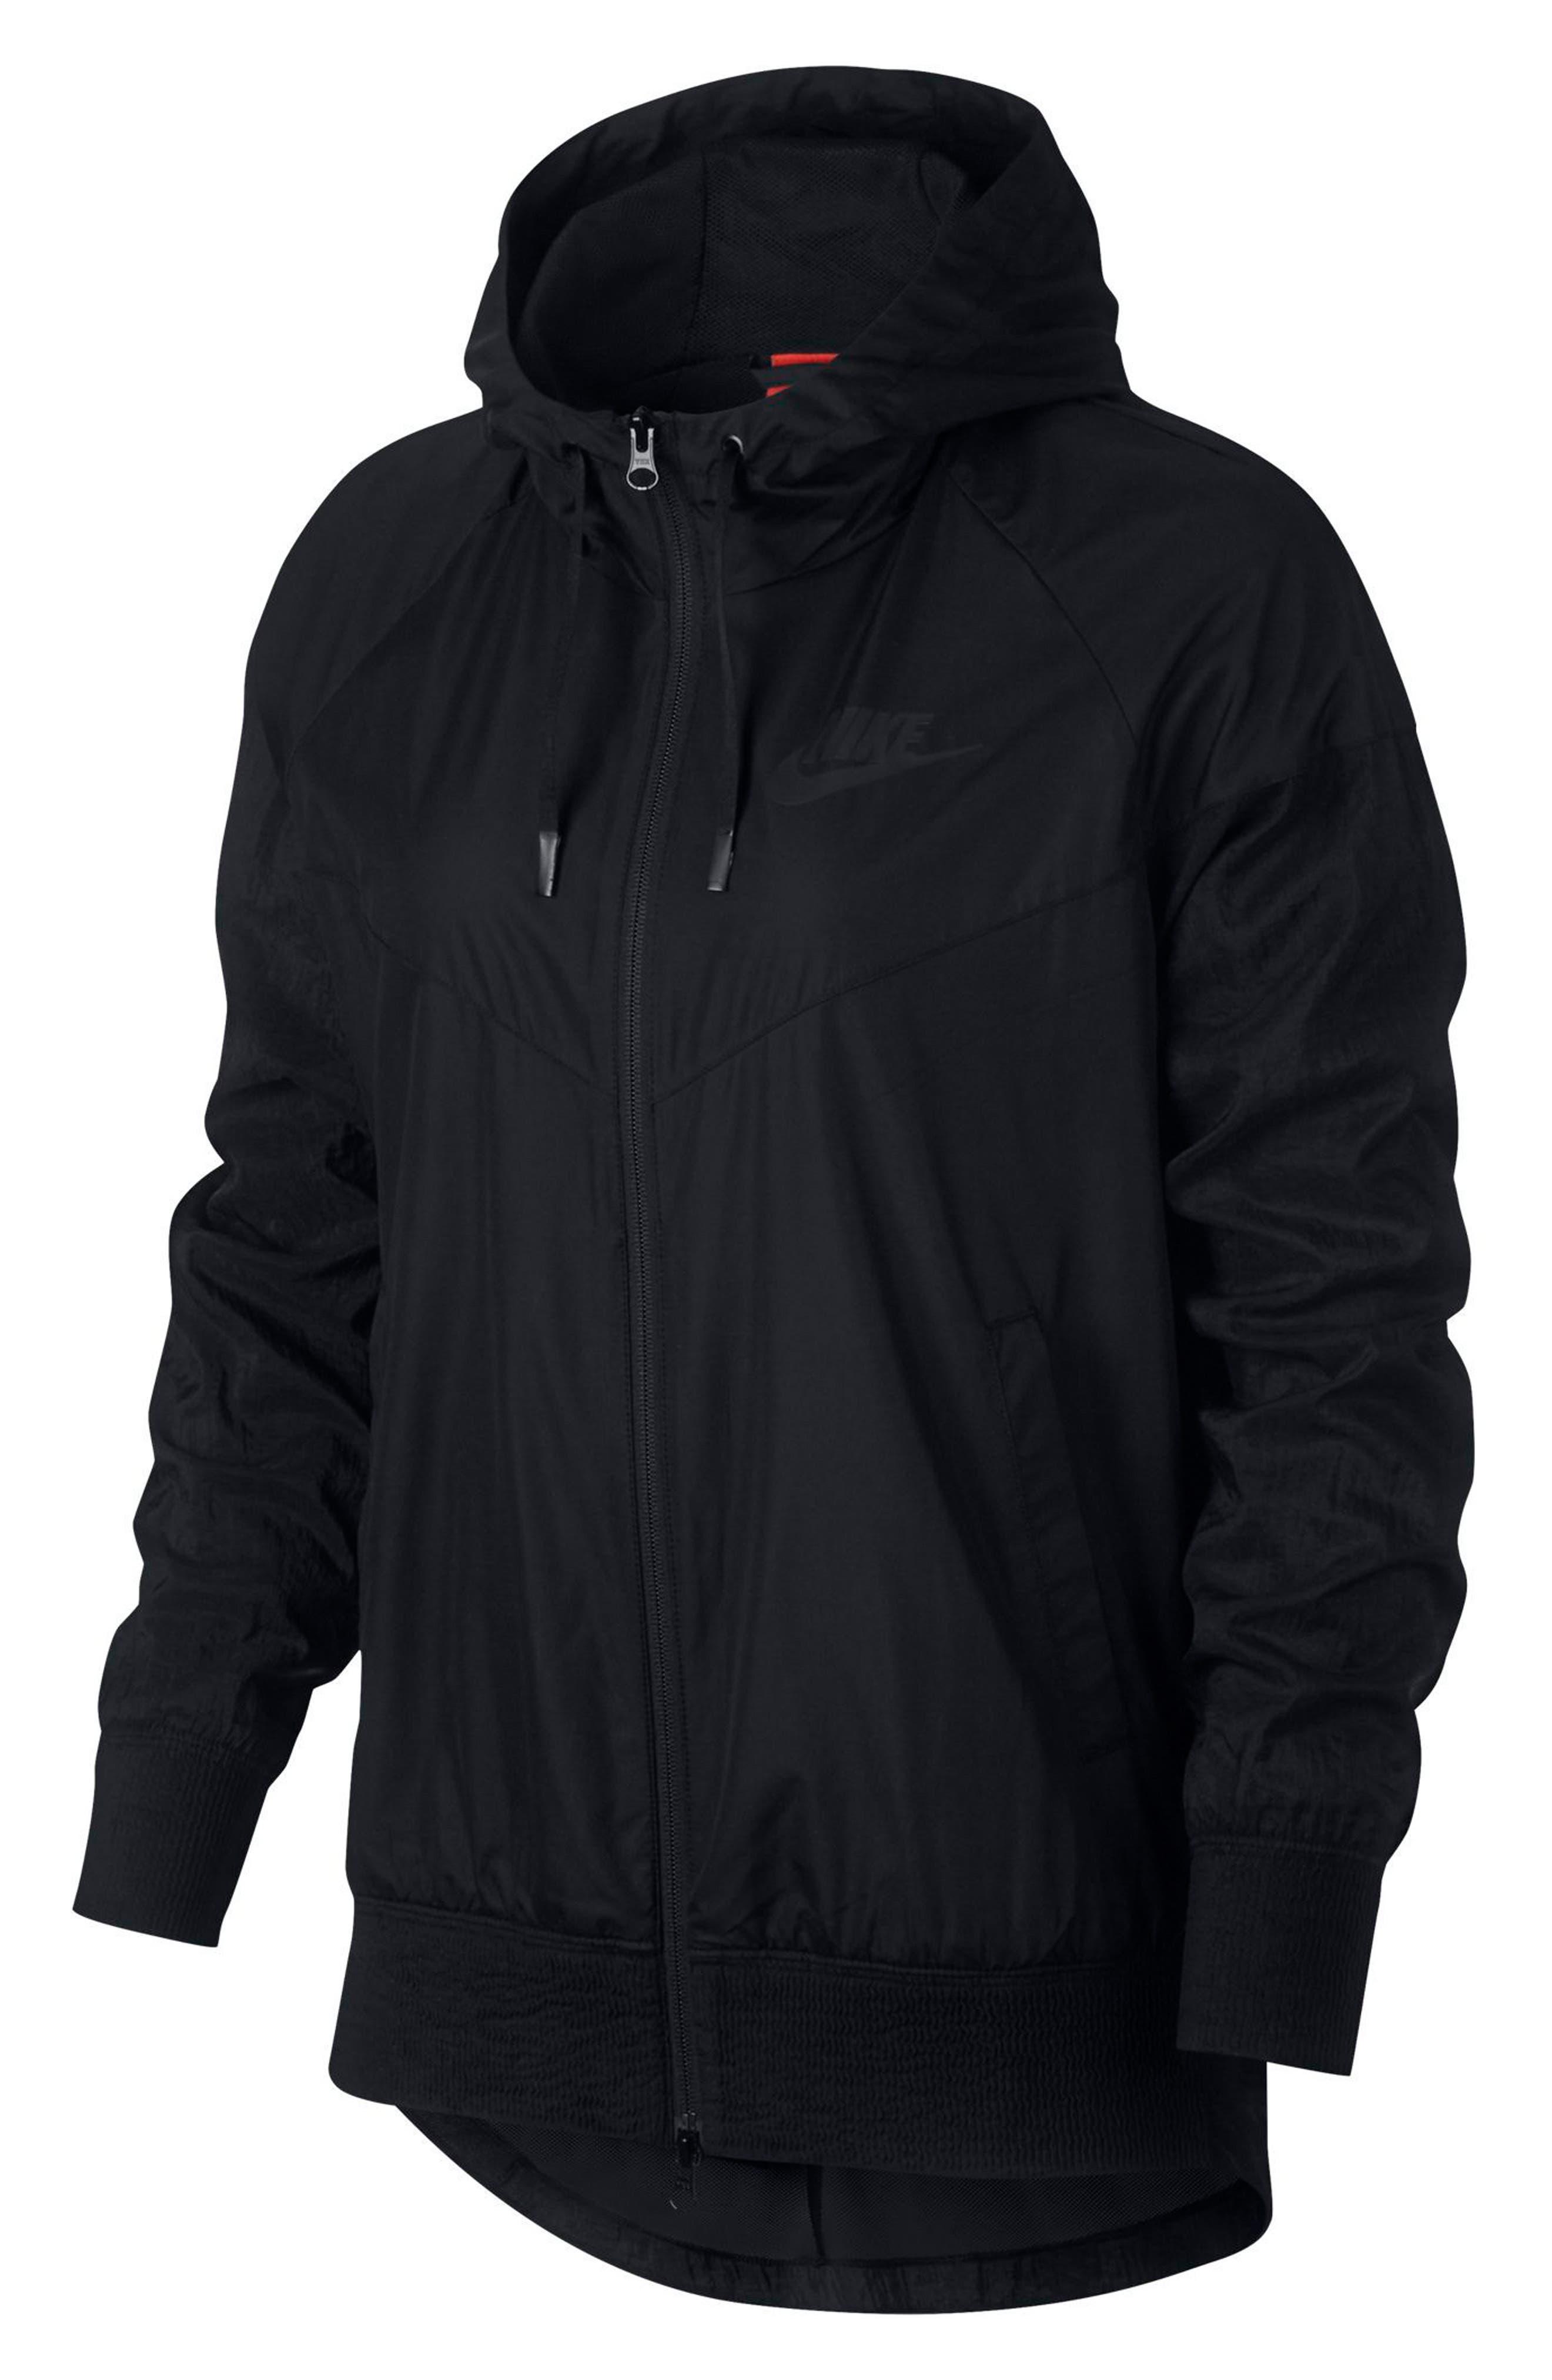 Sportswear Women's Windrunner Water Repellent Jacket,                             Main thumbnail 1, color,                             010